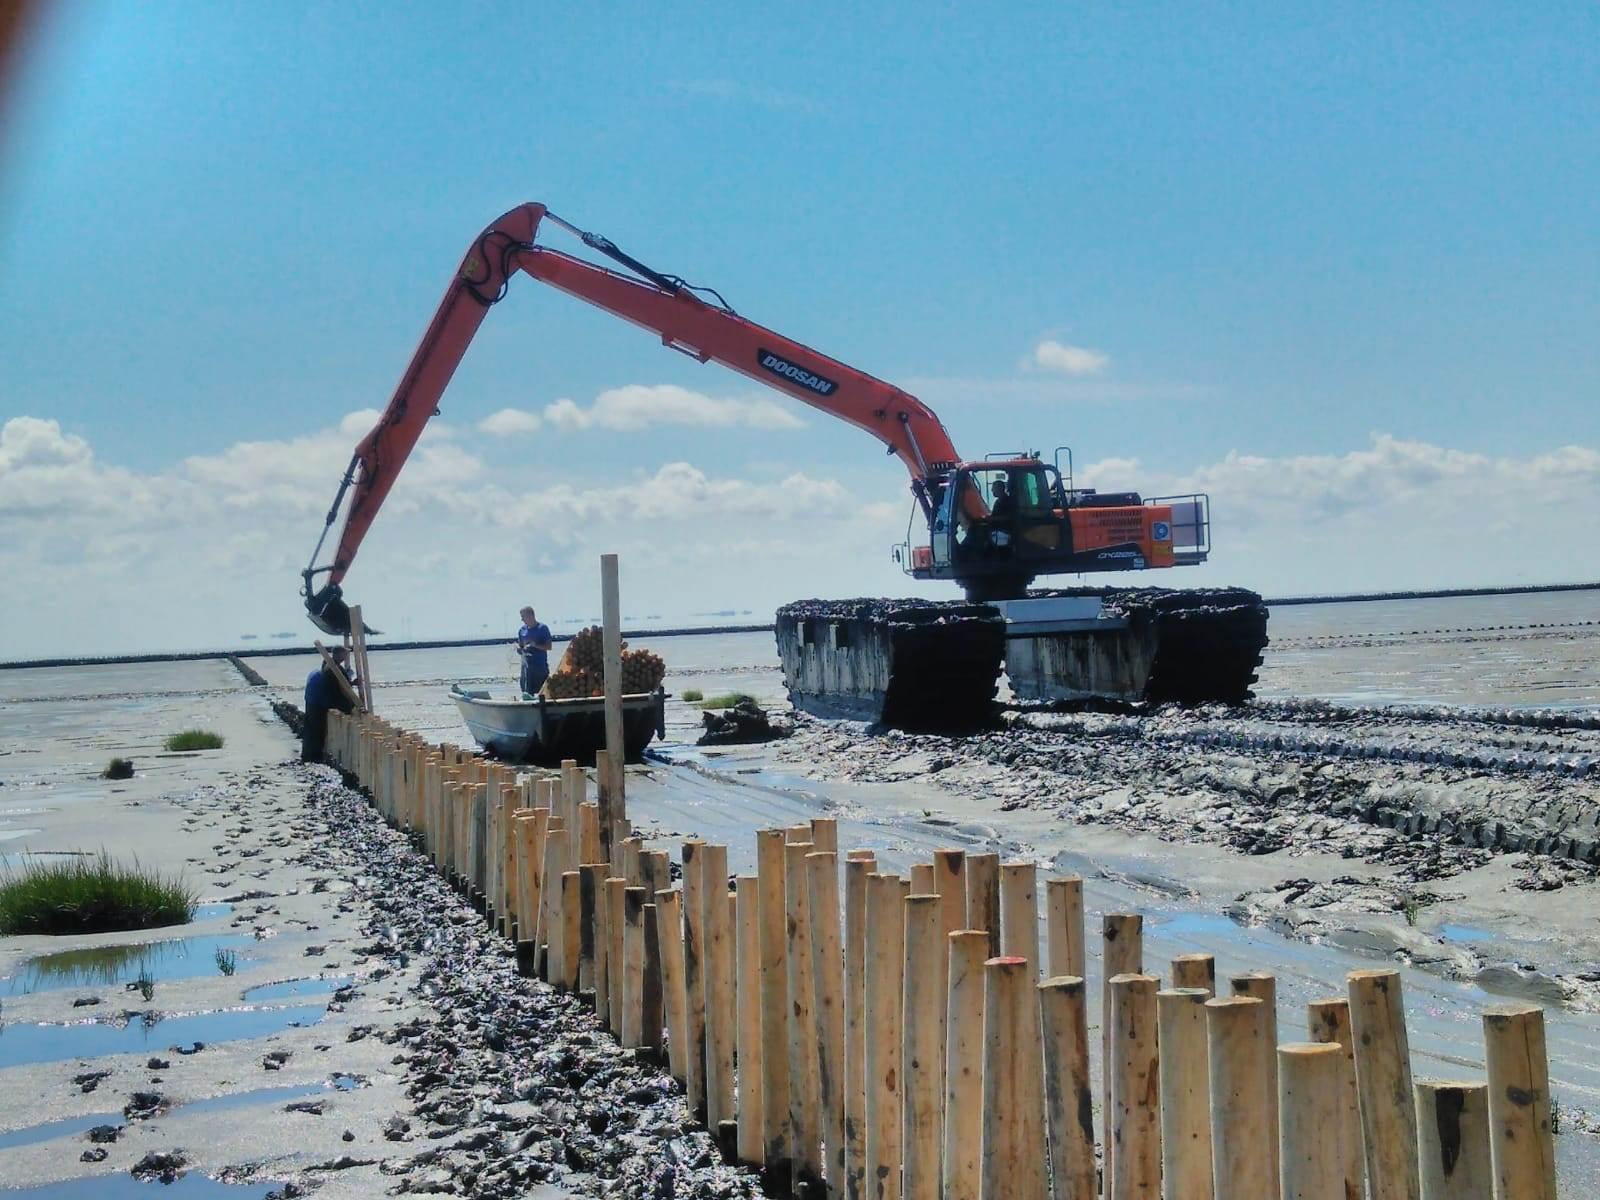 New 'All-Terrain' Doosan Excavator in Germany - Machinery